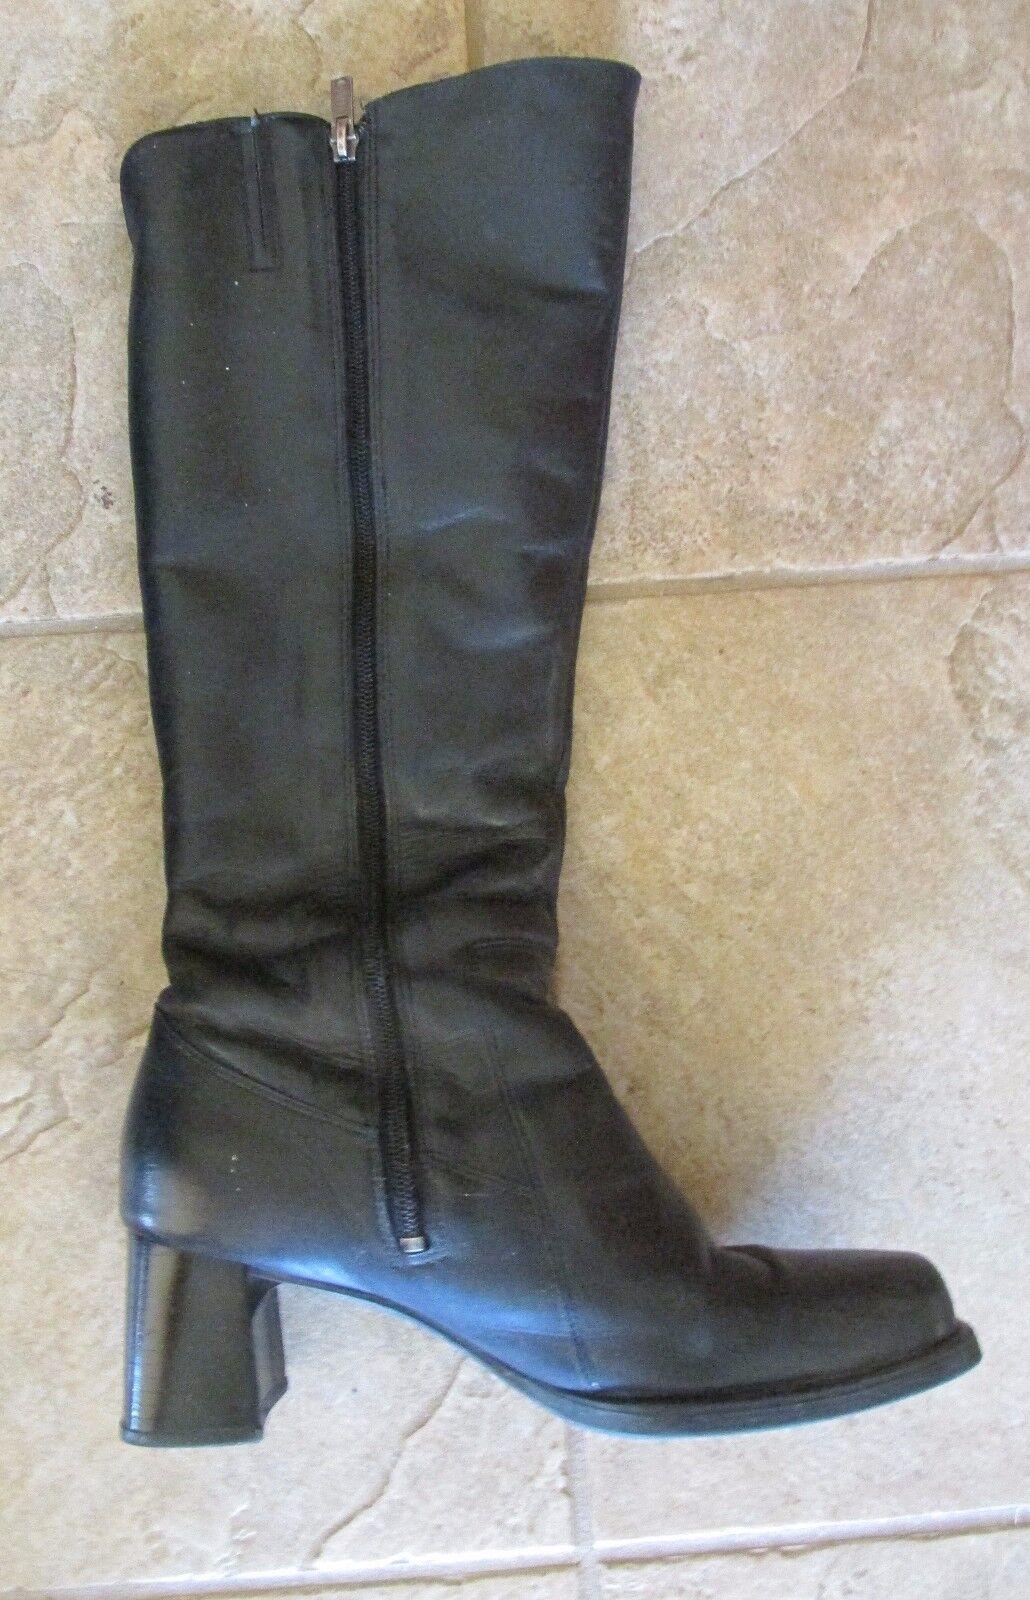 Janita Vintage Tall Knee High Black Black Black Leather Boots Size 40 Finland Zip Up Fashion ede13f